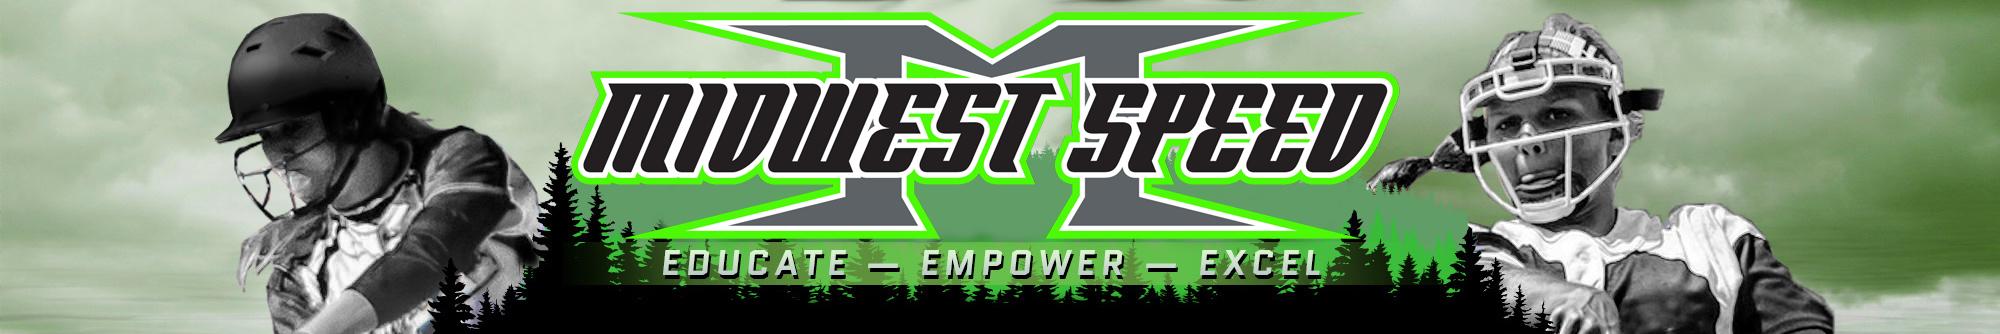 Midwest Speed - Minnesota Fastpitch Softball Club